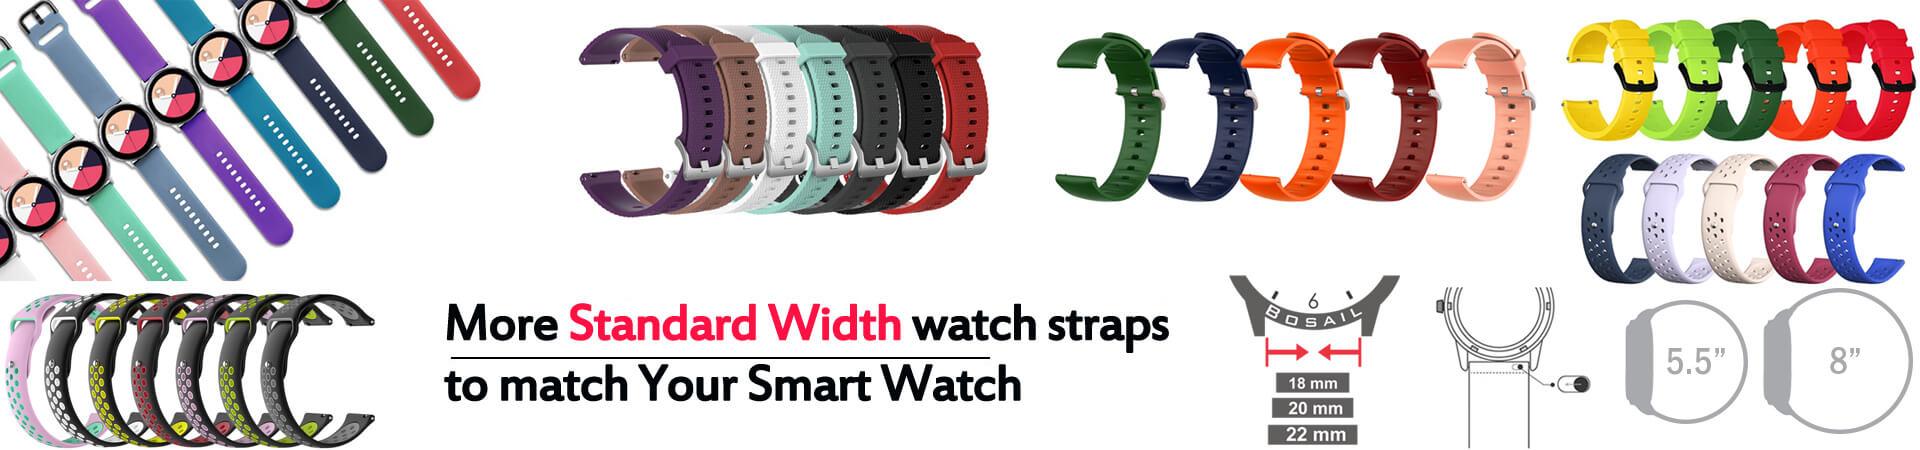 more standard width watch strap match your smart watch